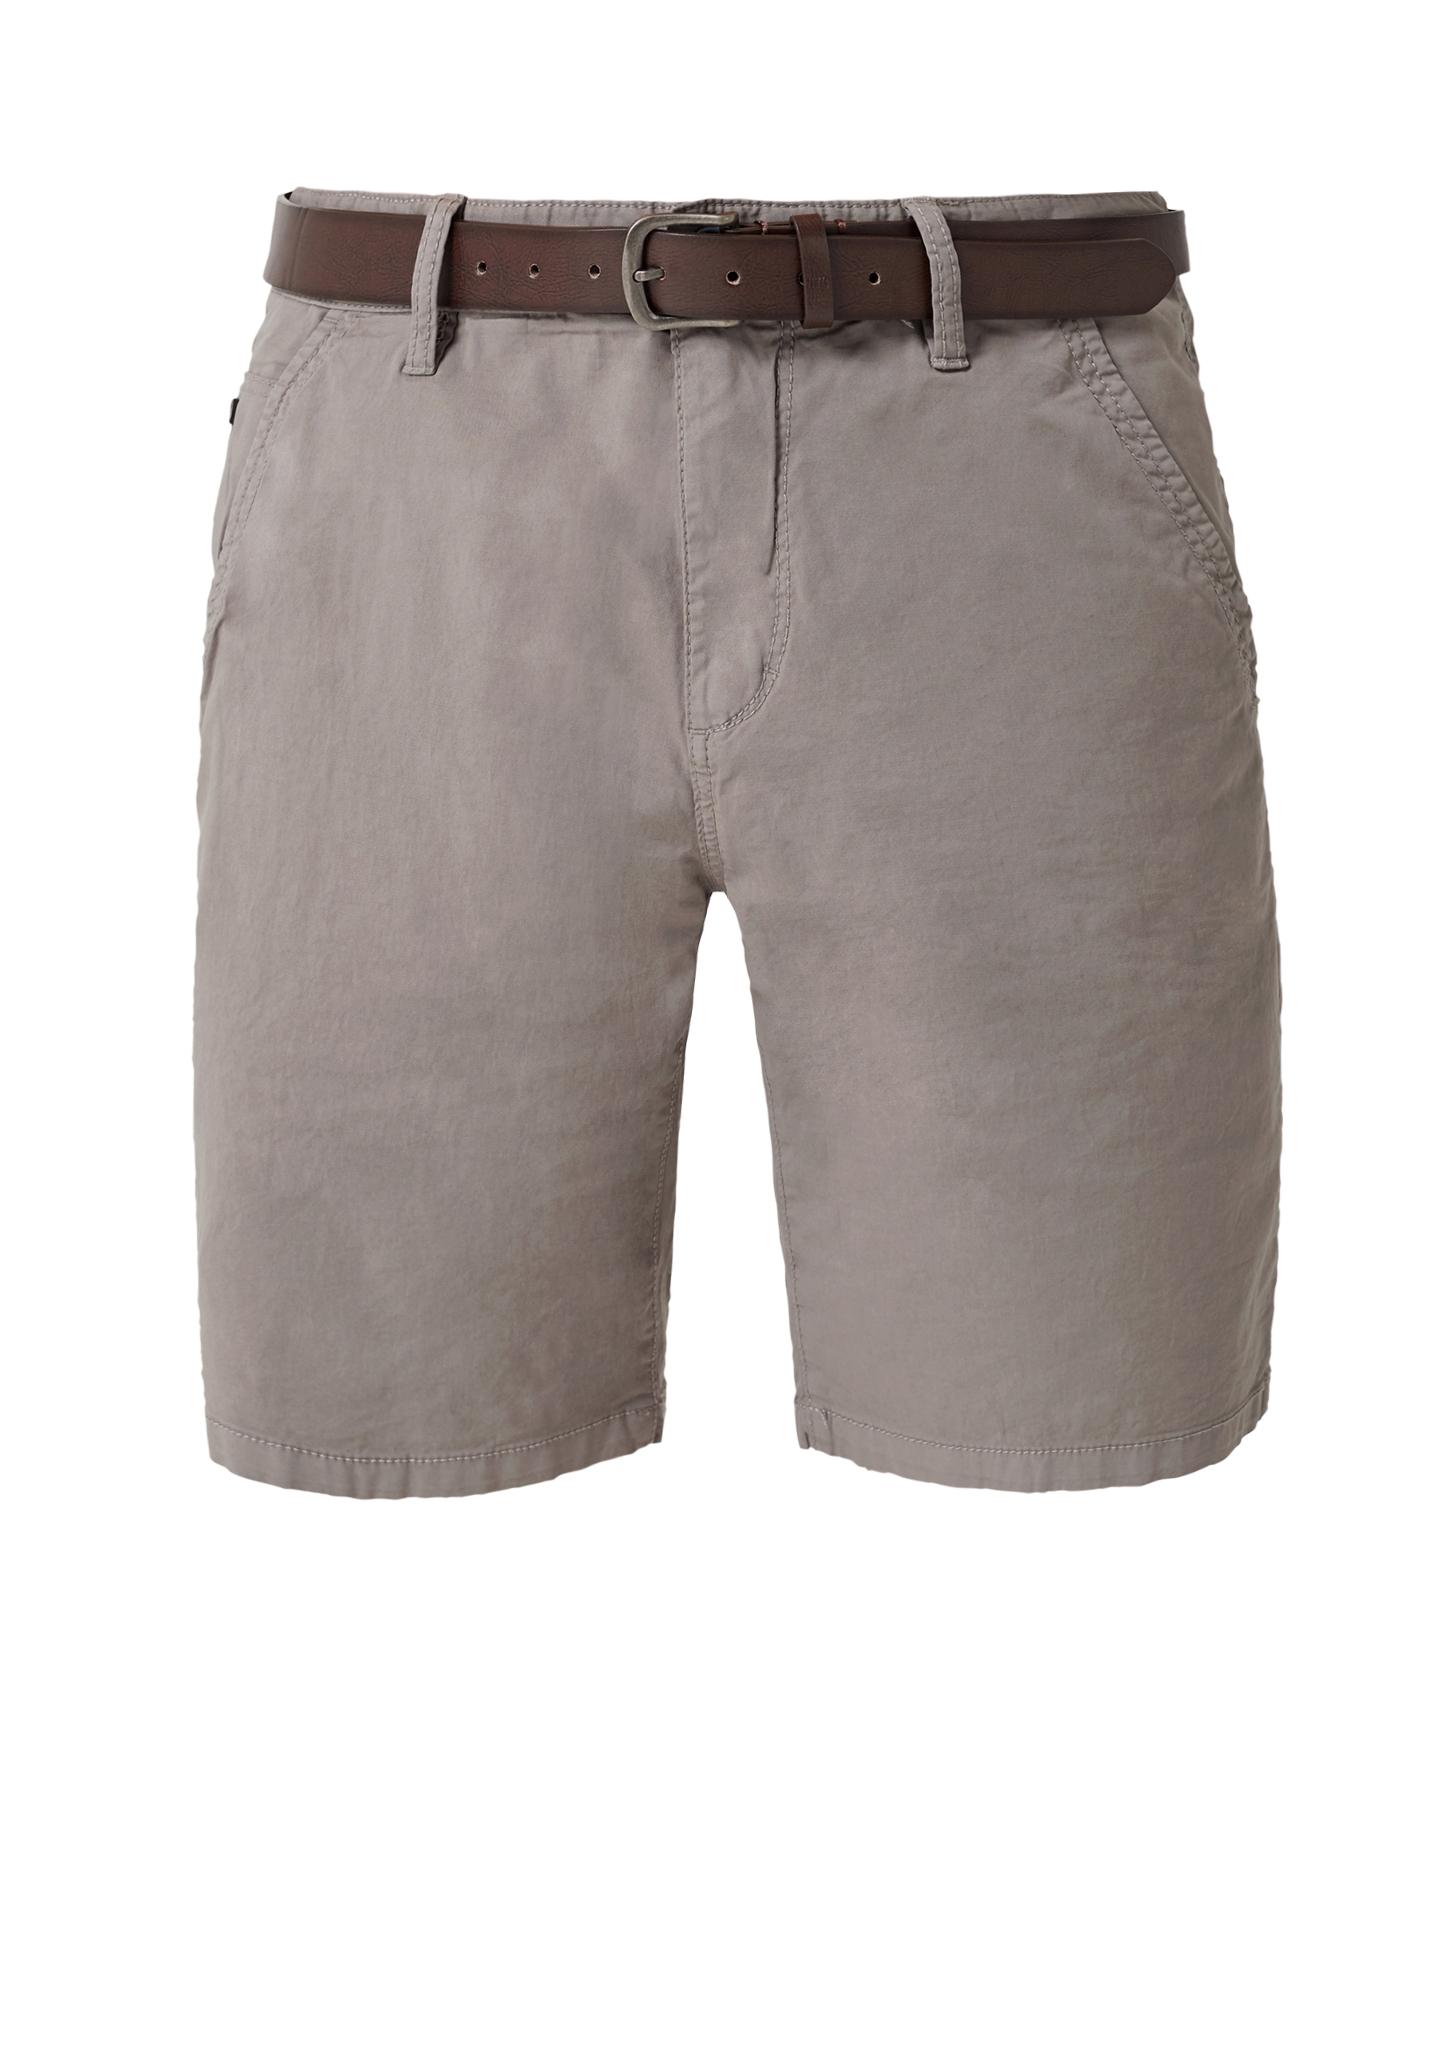 Chino-Bermuda | Bekleidung > Shorts & Bermudas > Bermudas | s.Oliver